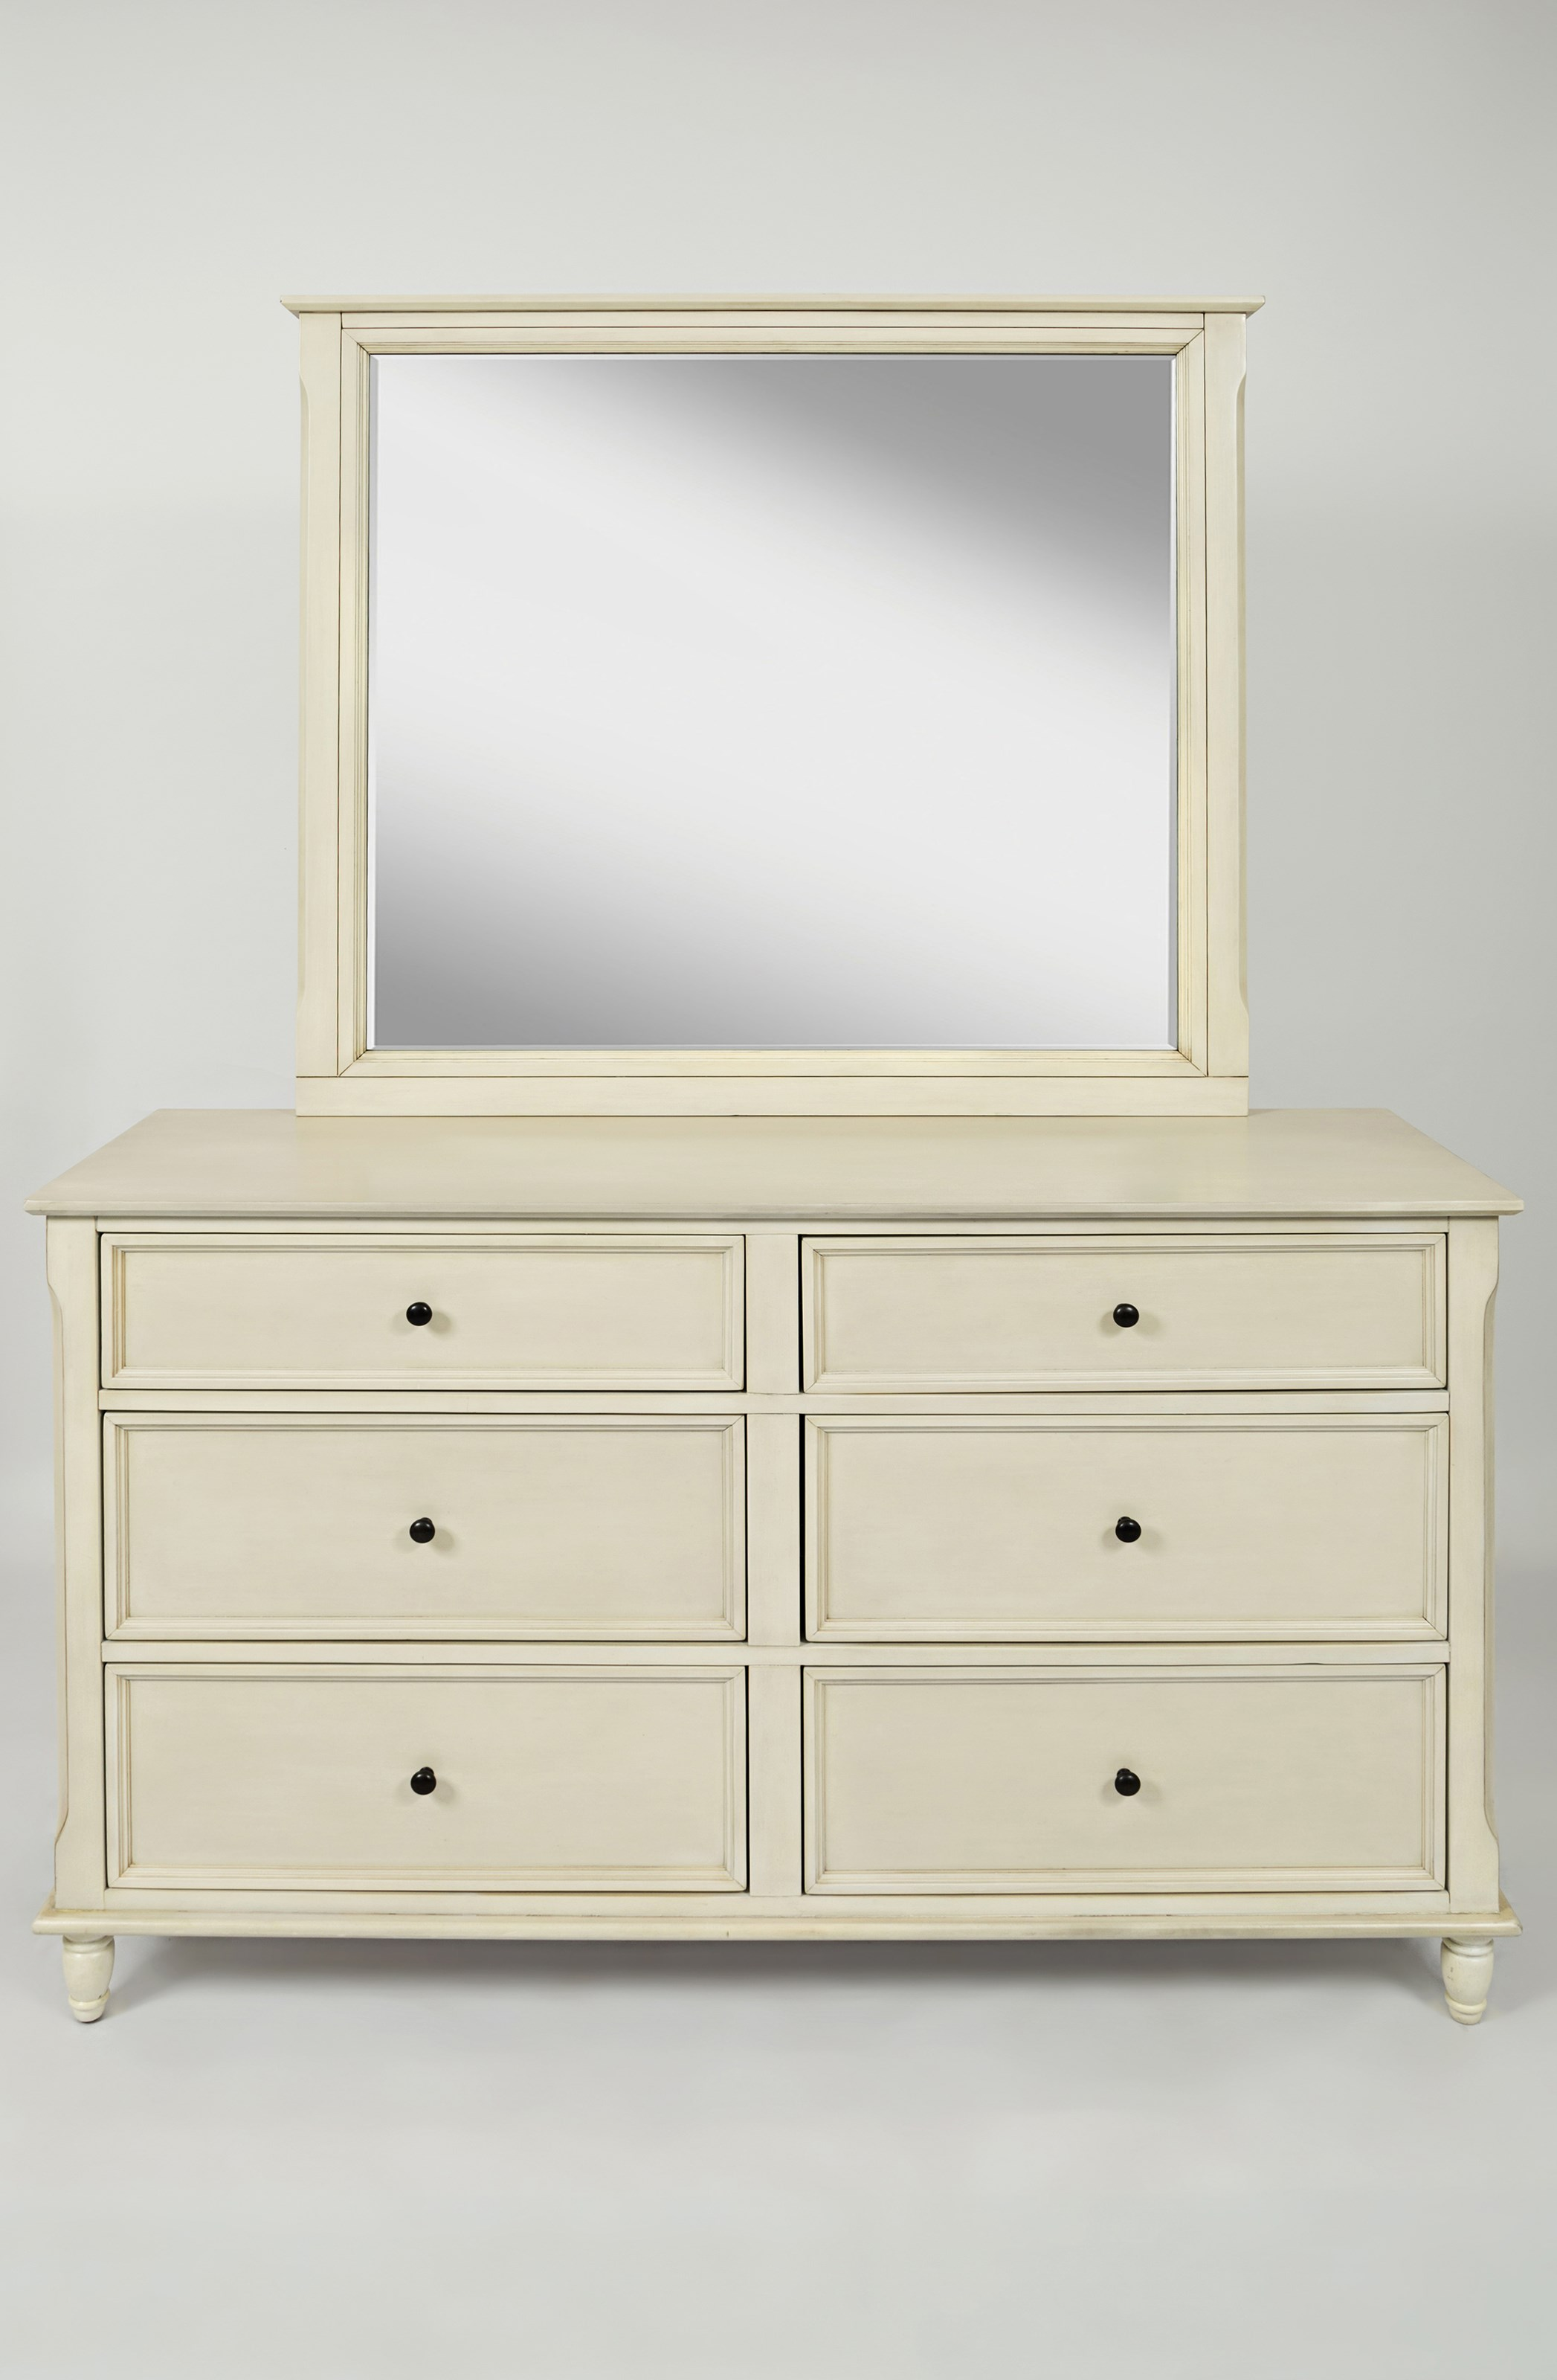 Jofran Avignon Youth Dresser and Mirror Set - Item Number: 1617-10+20